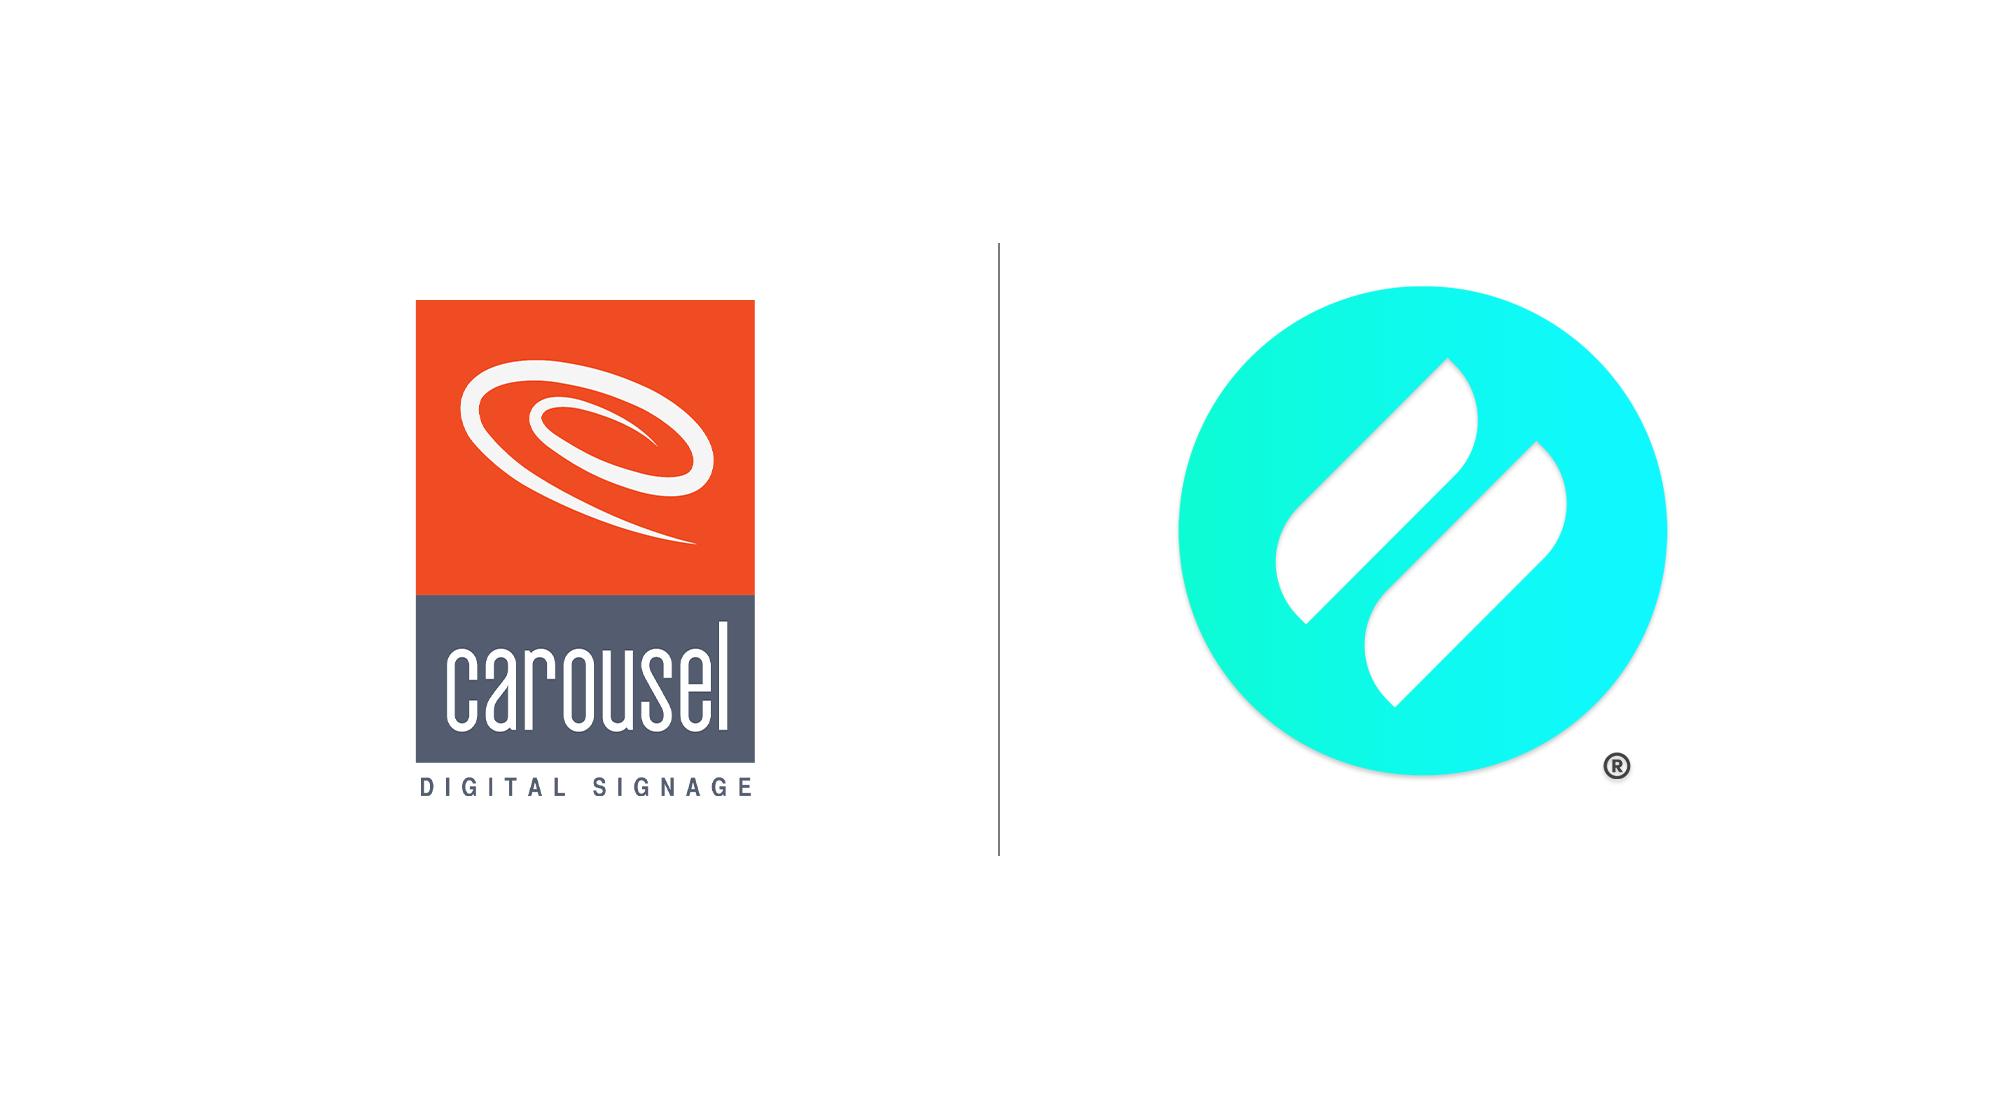 ditto logo and carousel logo